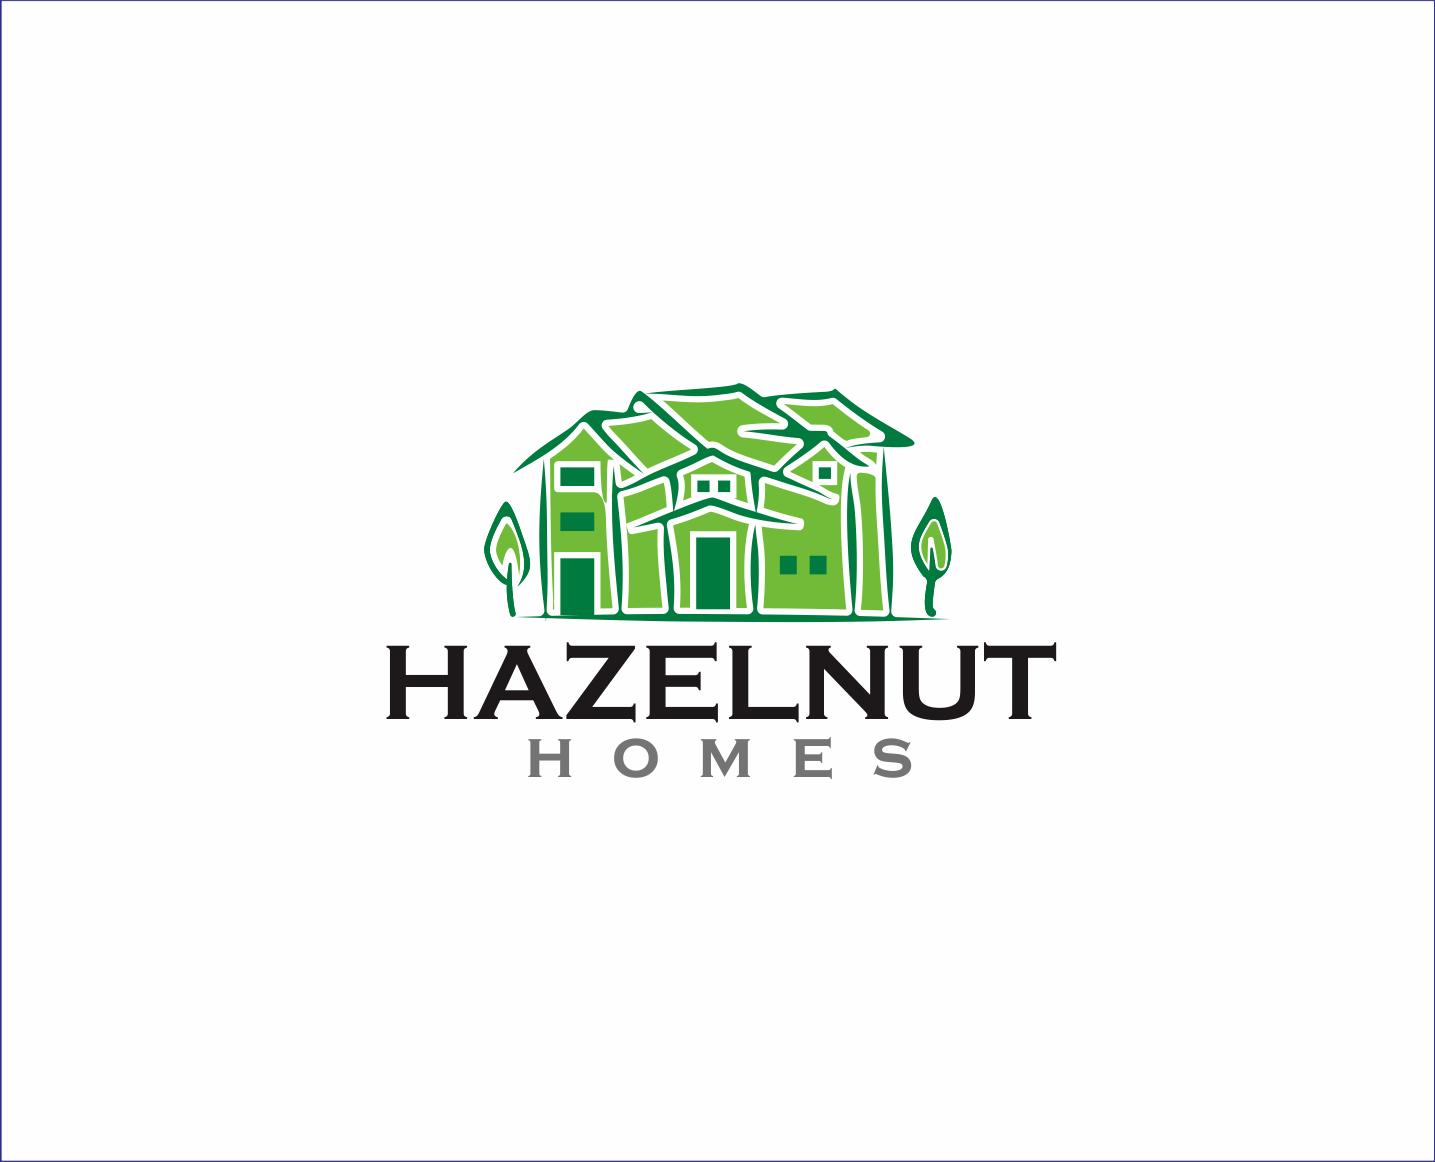 Logo Design by Armada Jamaluddin - Entry No. 70 in the Logo Design Contest Unique Logo Design Wanted for Hazelnut Homes.